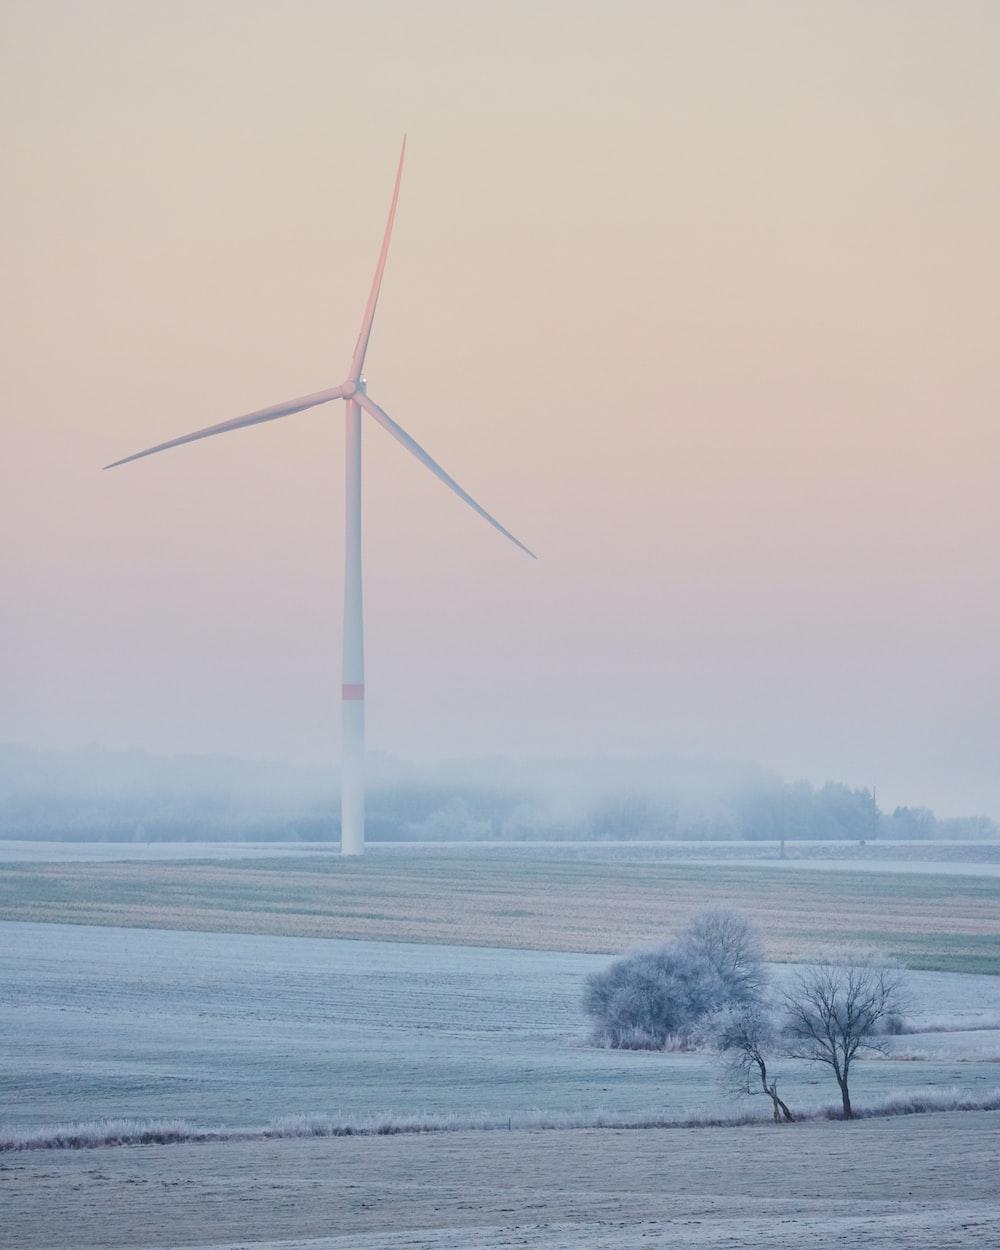 landscape photo of windmill on grass field